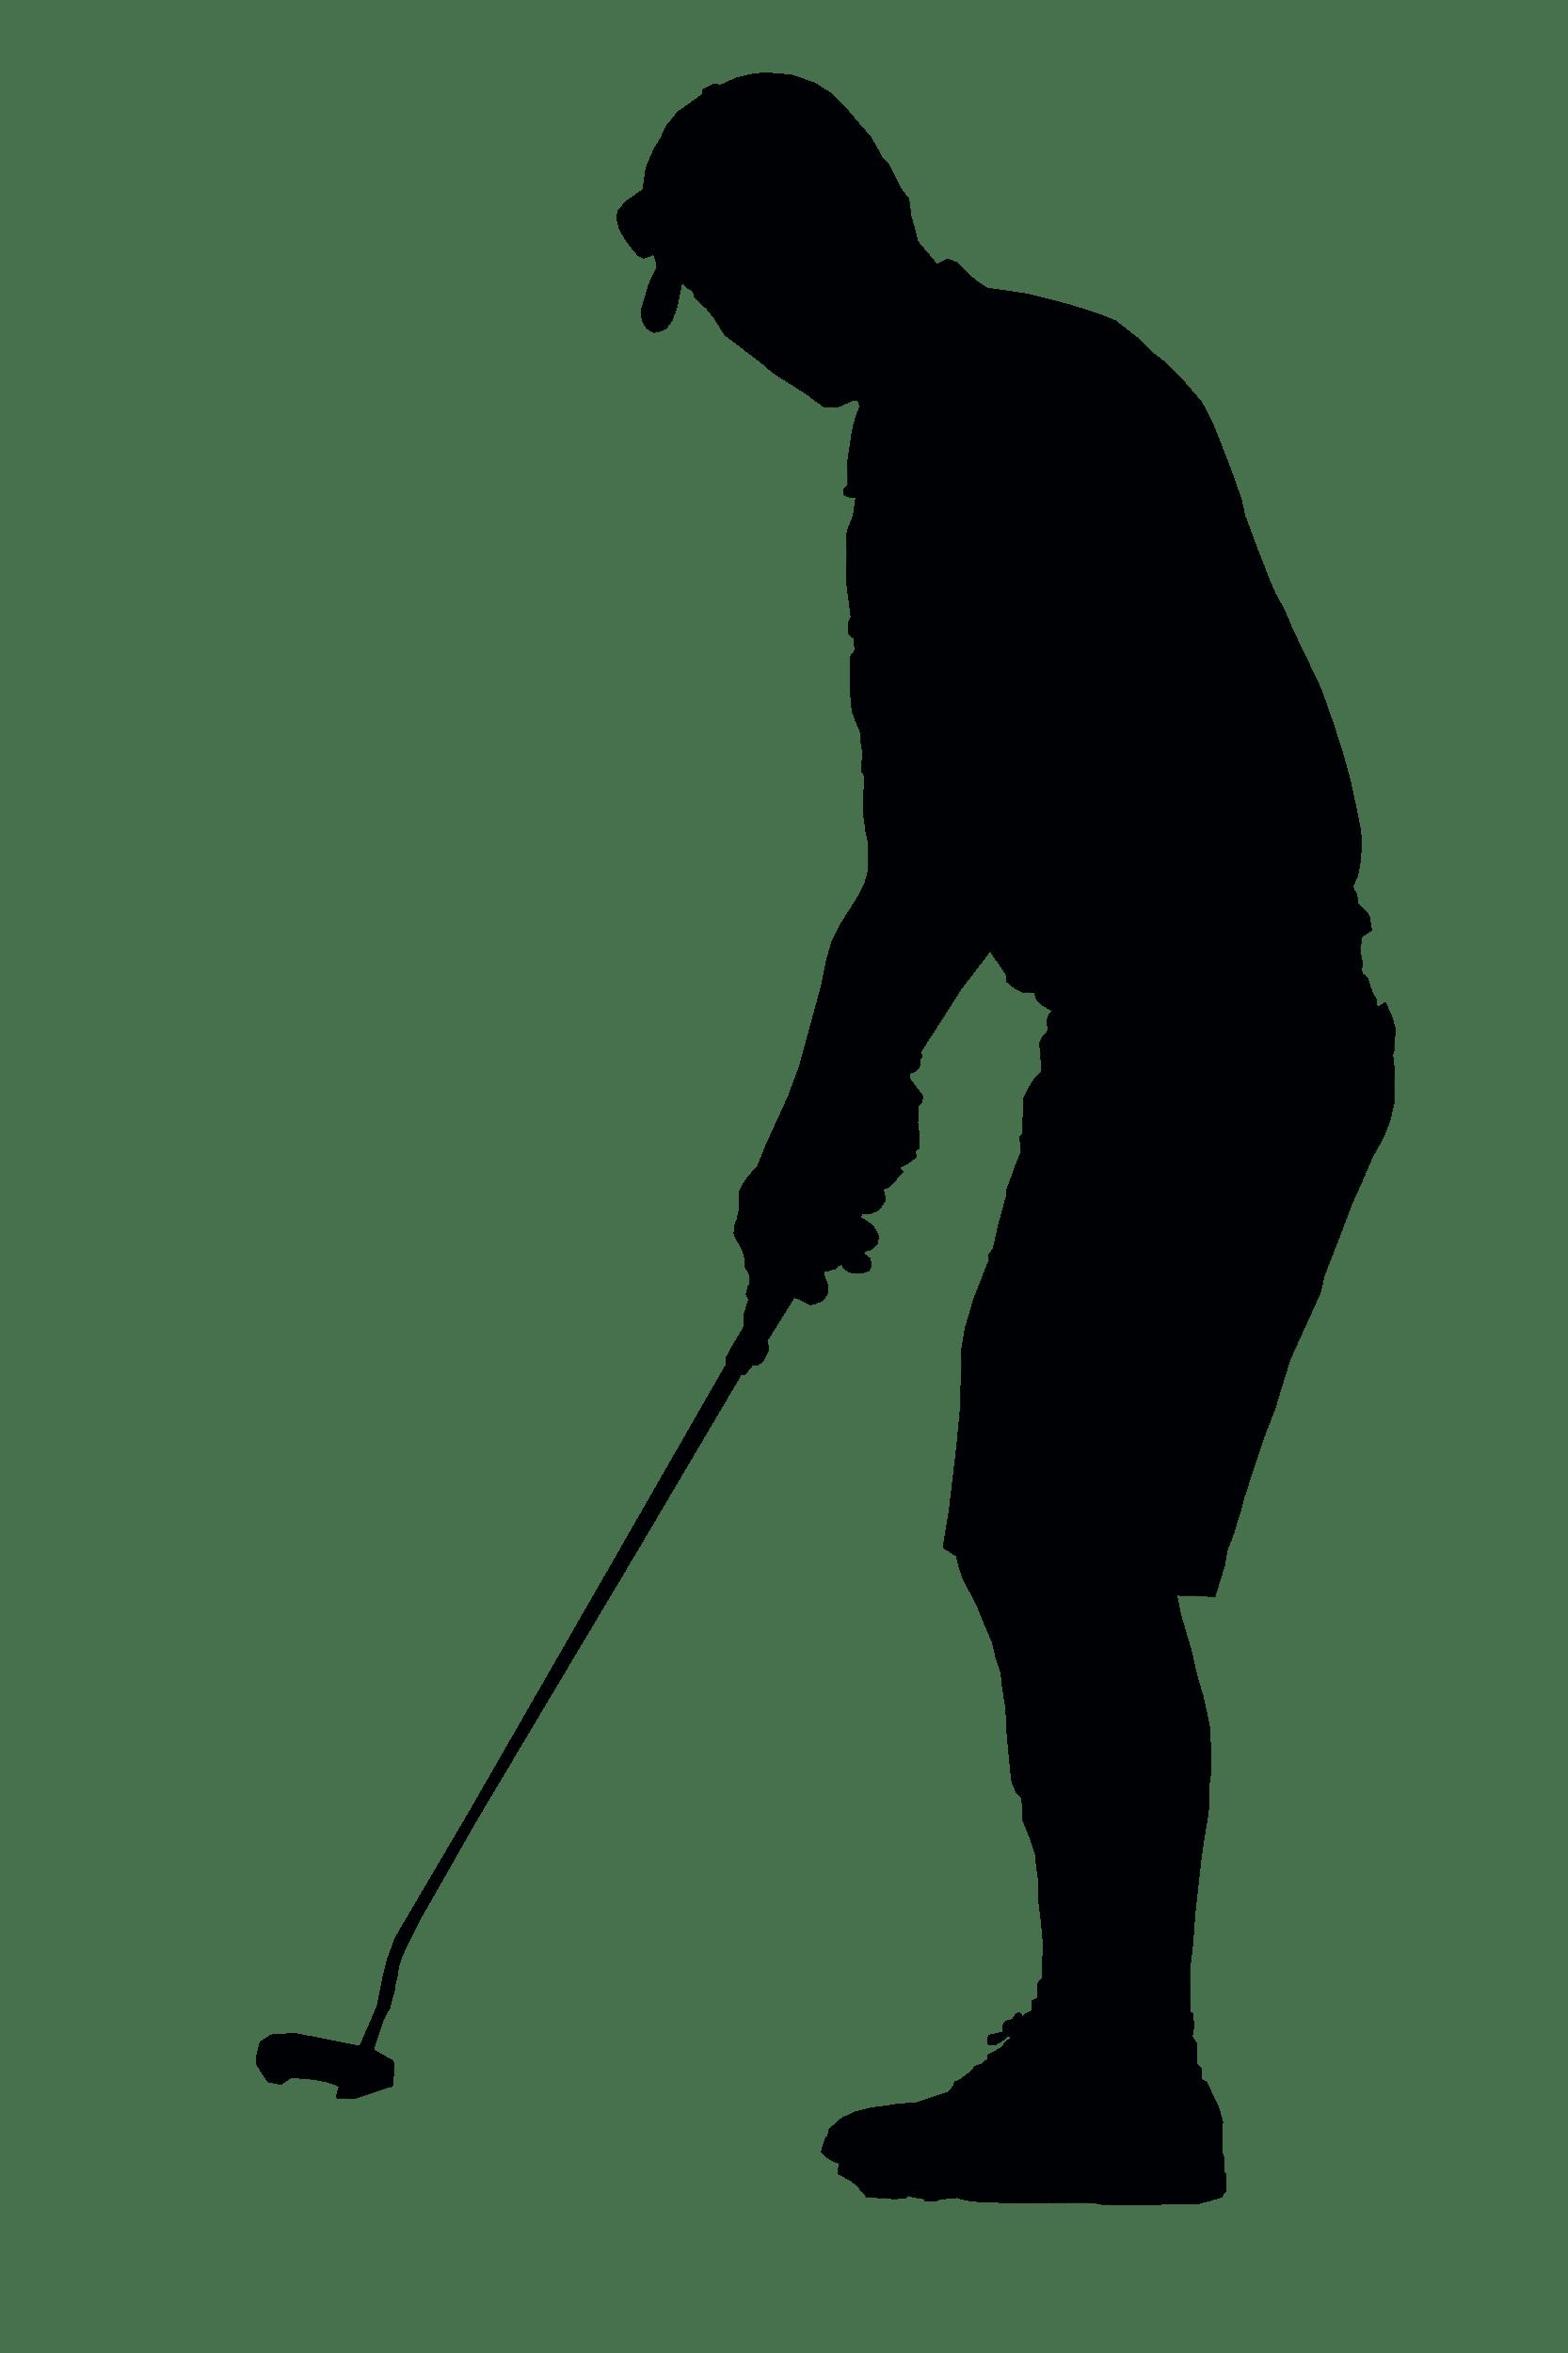 hight resolution of golfer